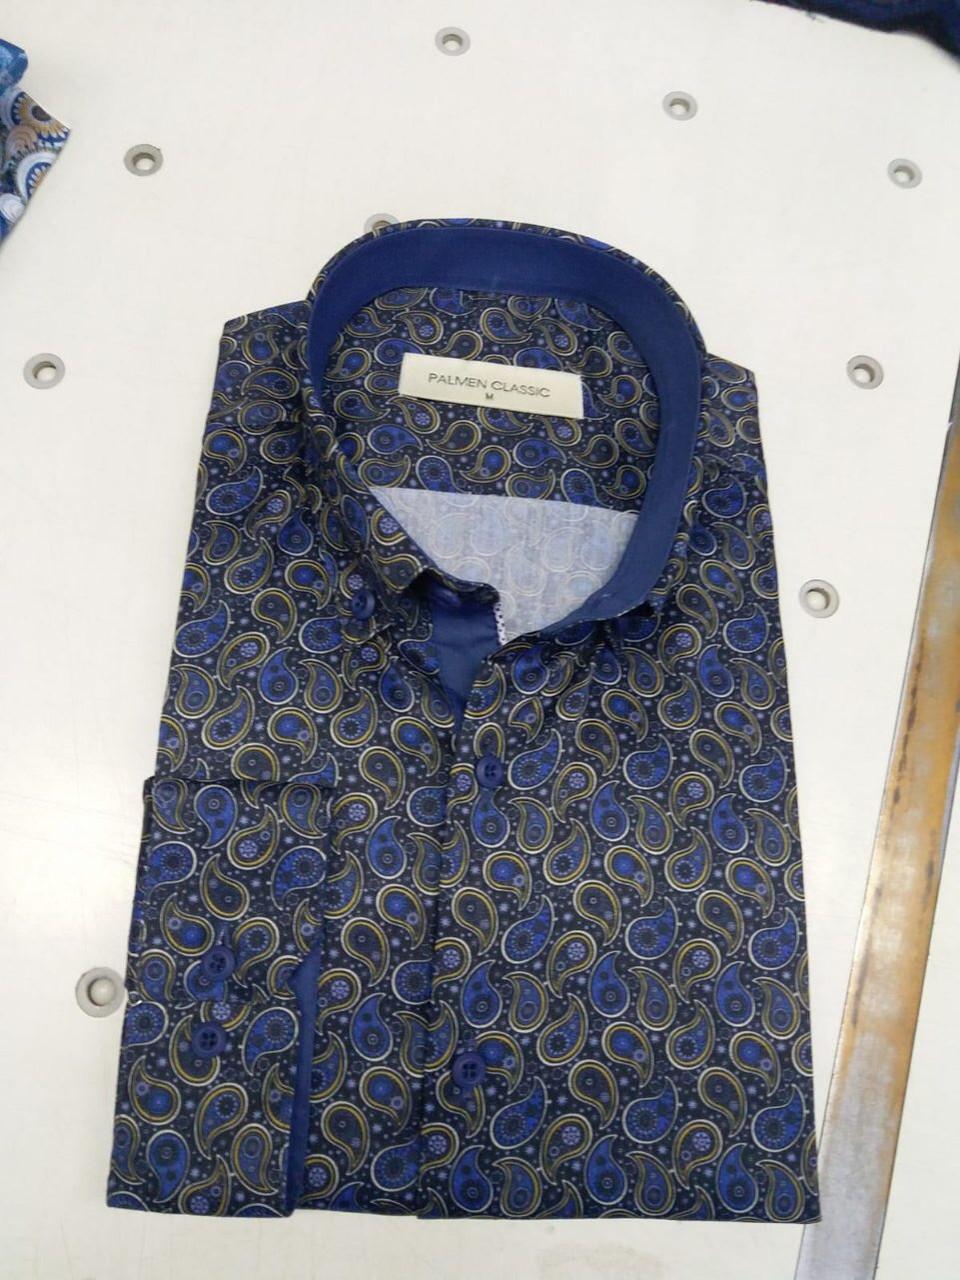 Sale!!! Турецкая фирменная рубашка Palmen